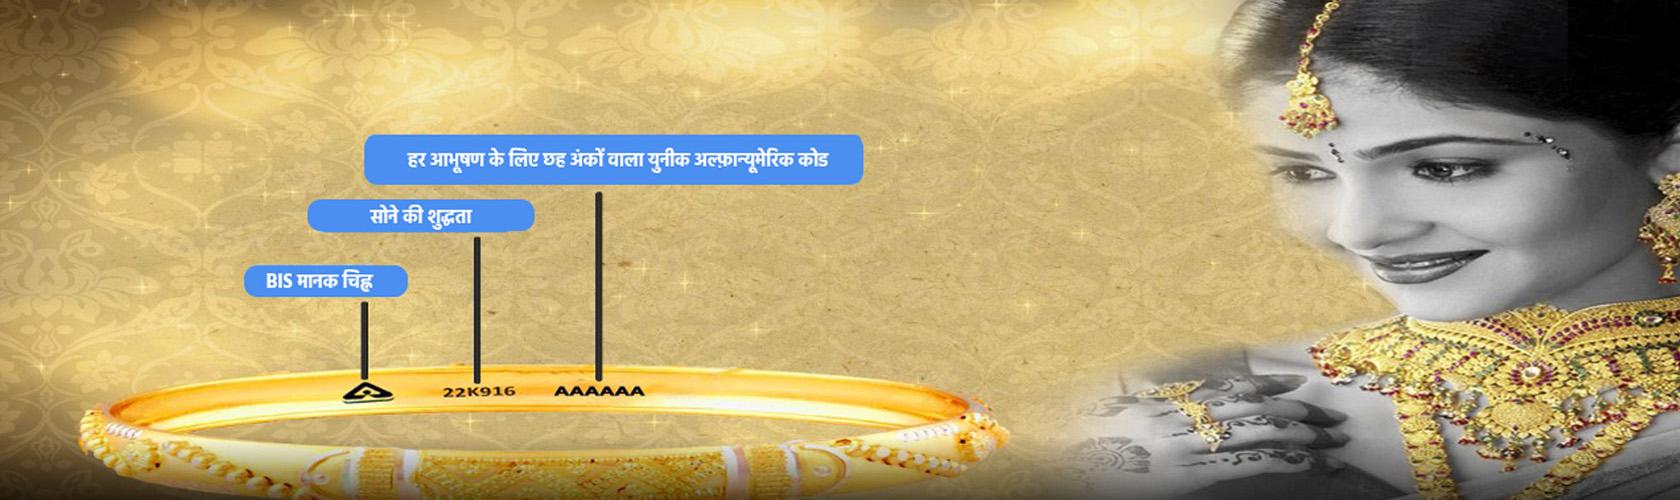 655388148(English) BISHallmarking_Hindi